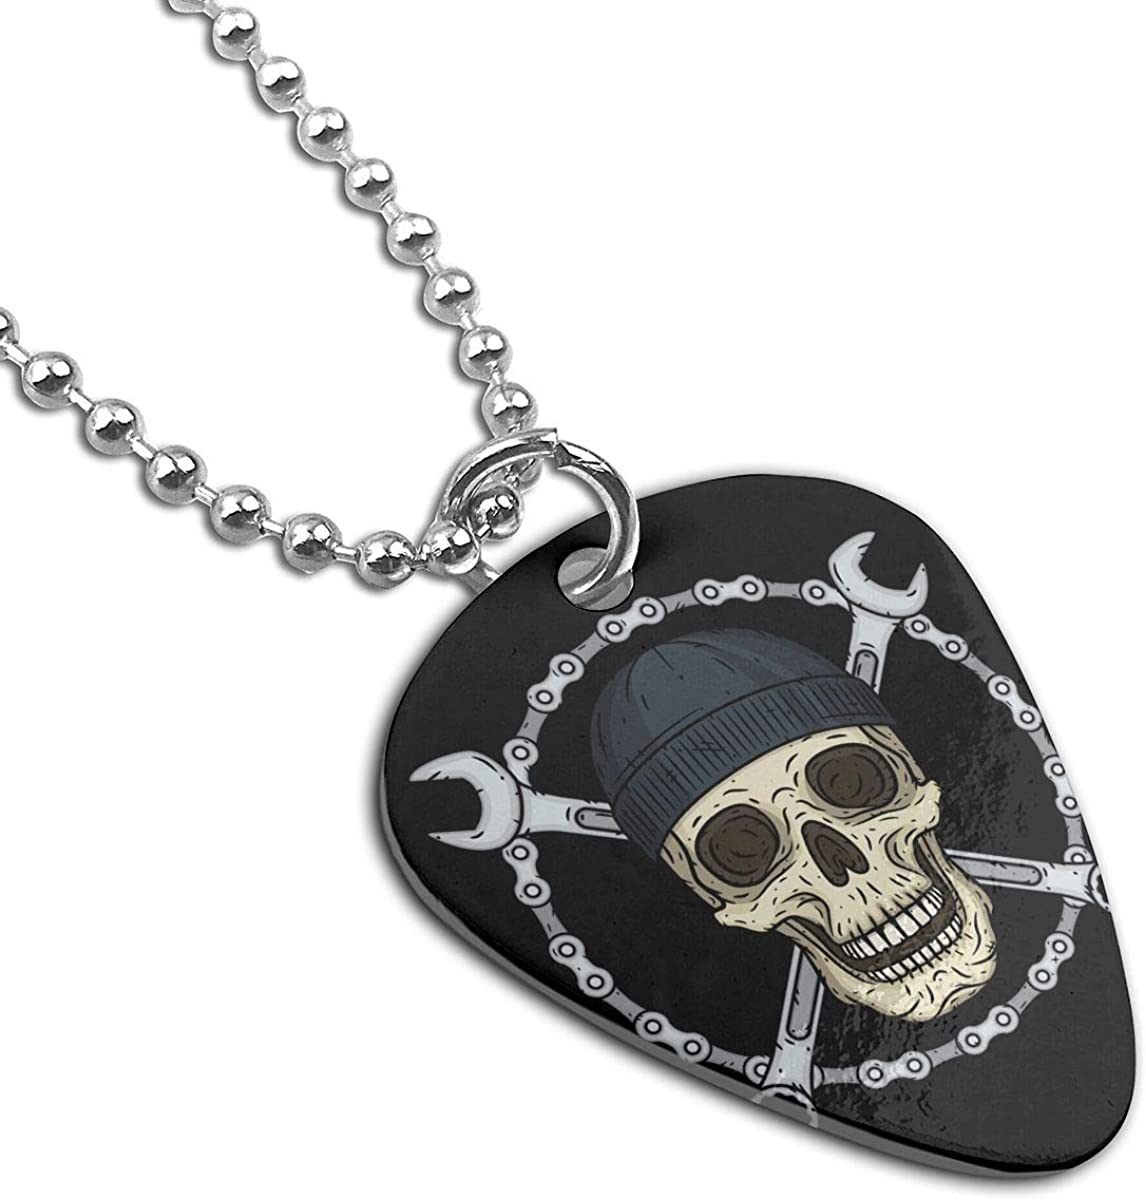 Skull Mechanic Custom Guitar Pick Pendant Necklace Keychain